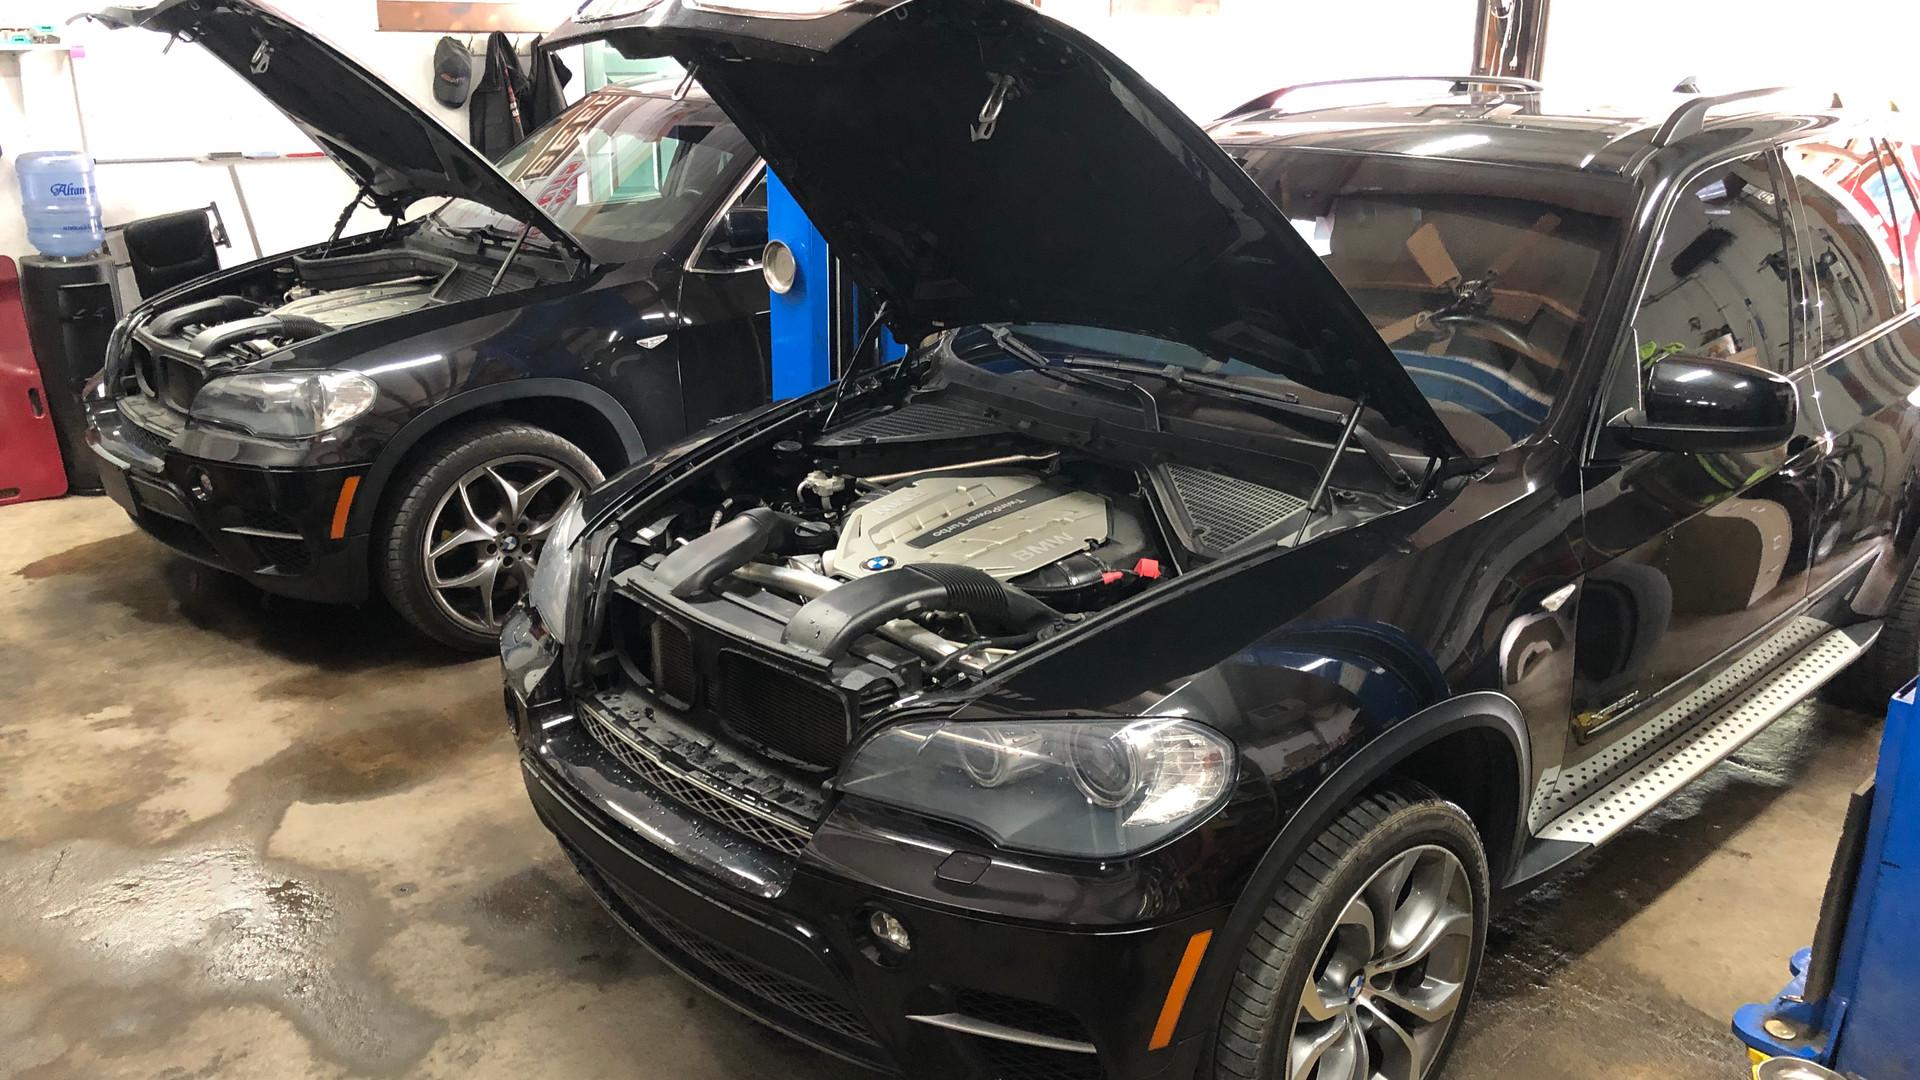 BMW X5 in Empire Automotive Repair shop